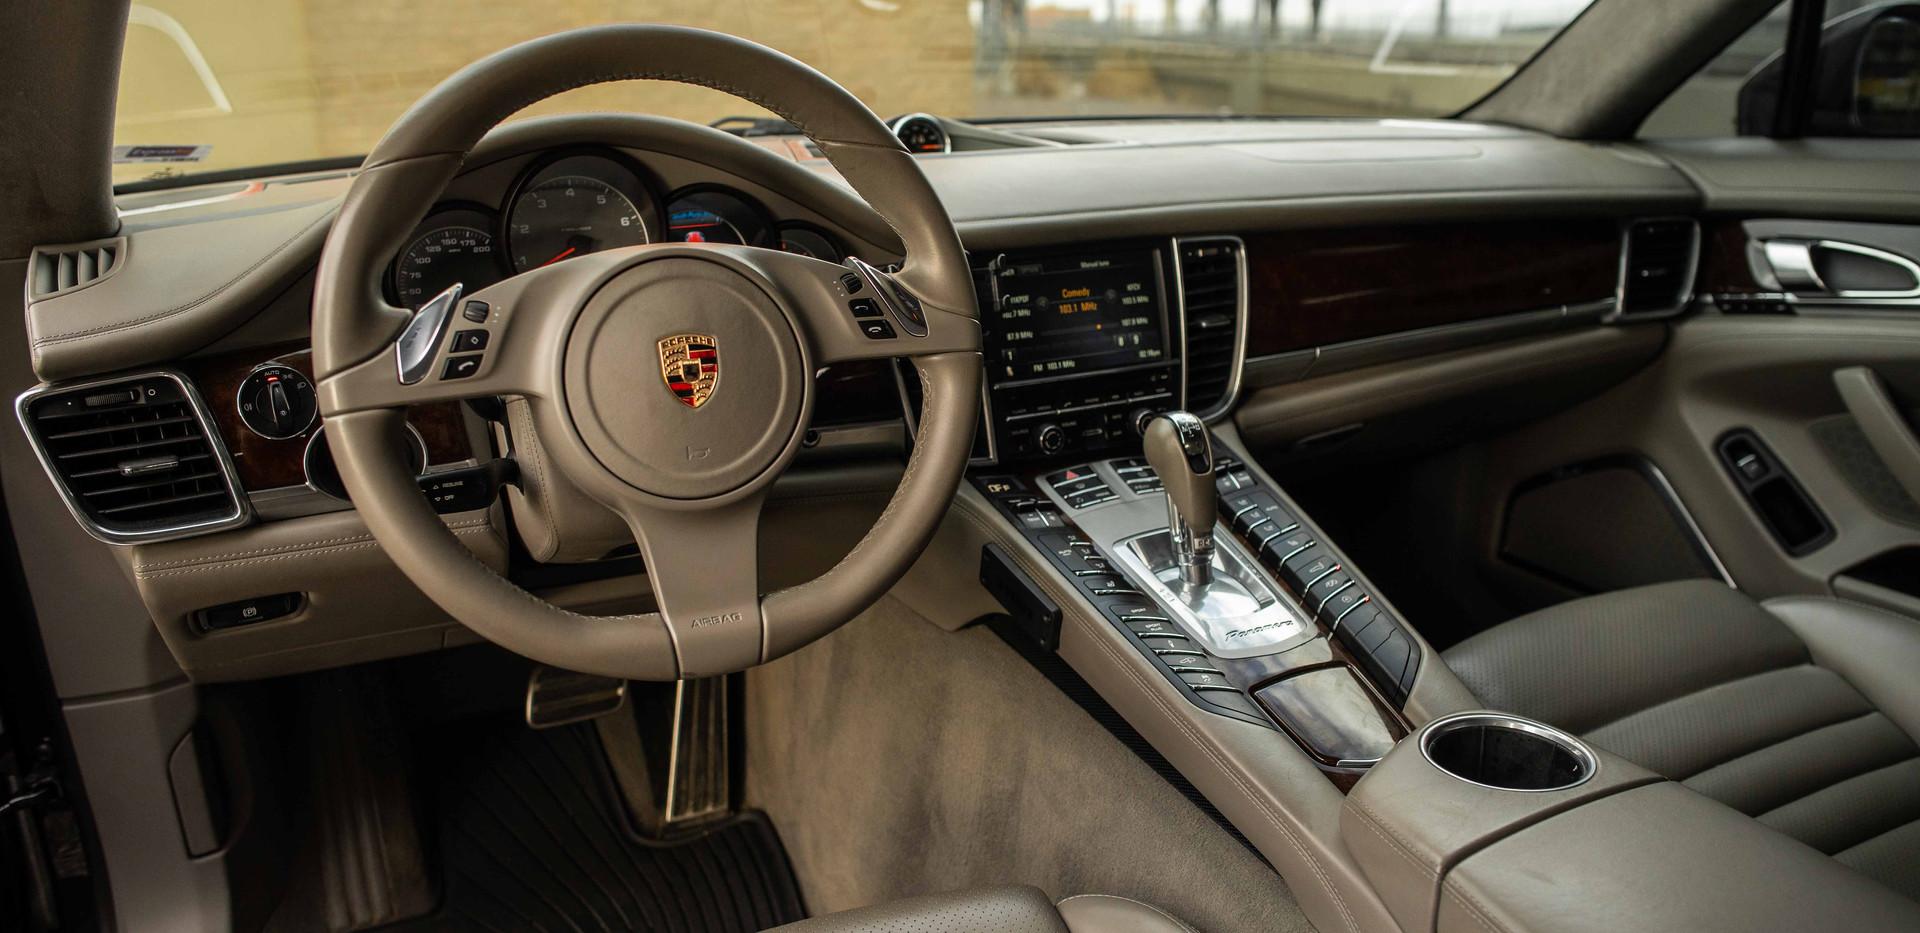 Interior_Driver_Panamara2.jpg